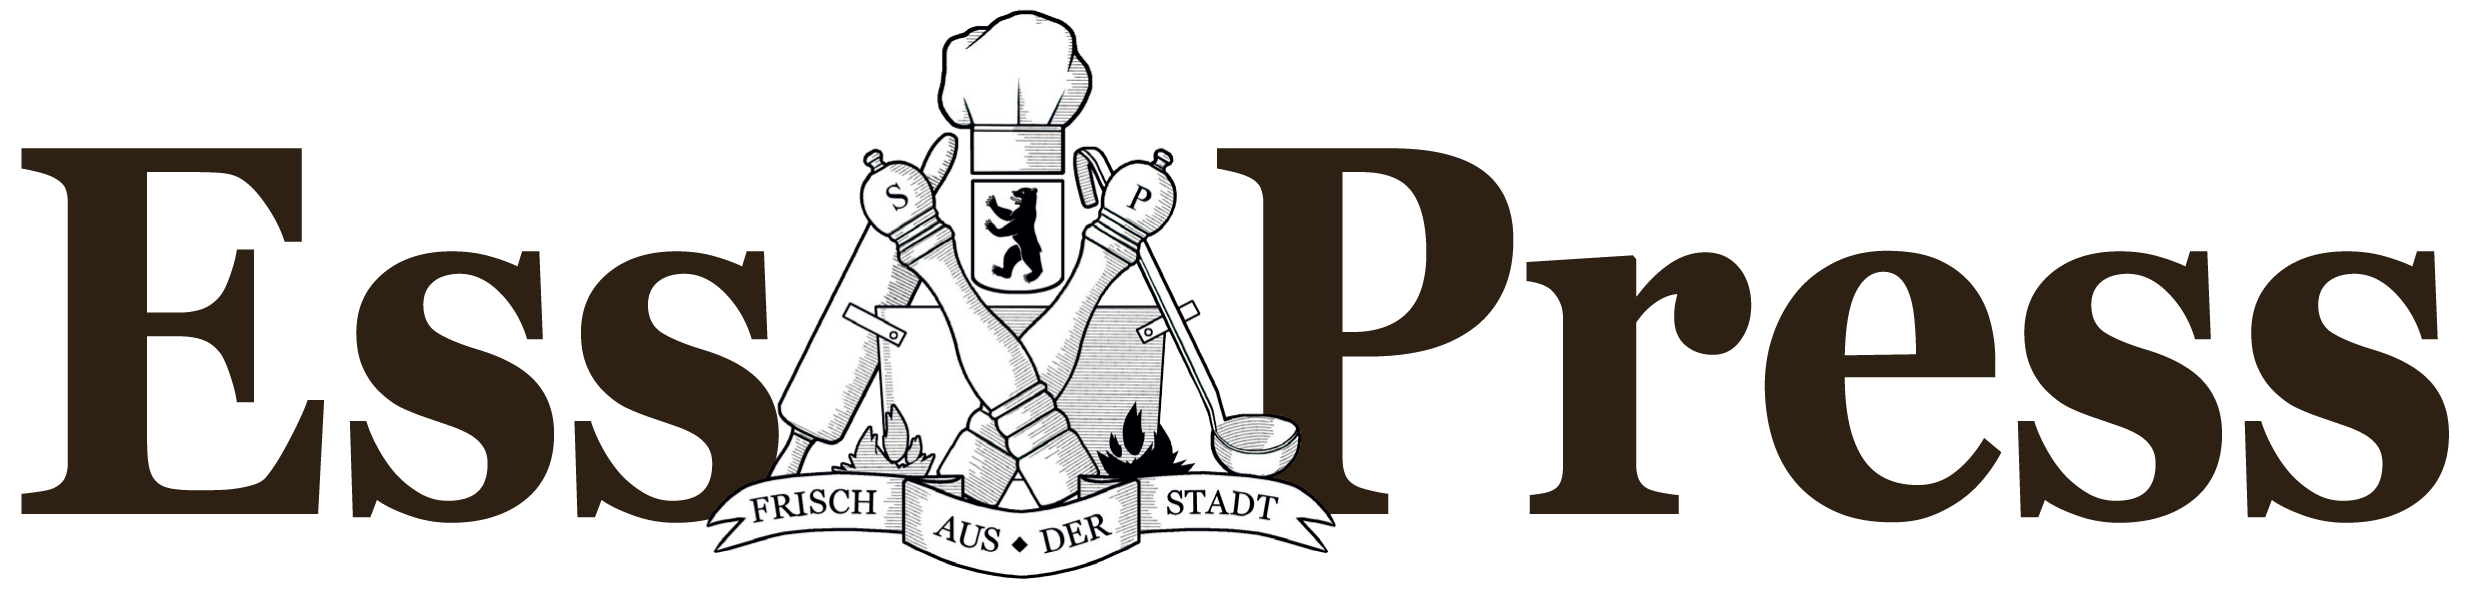 esspress_logo.png